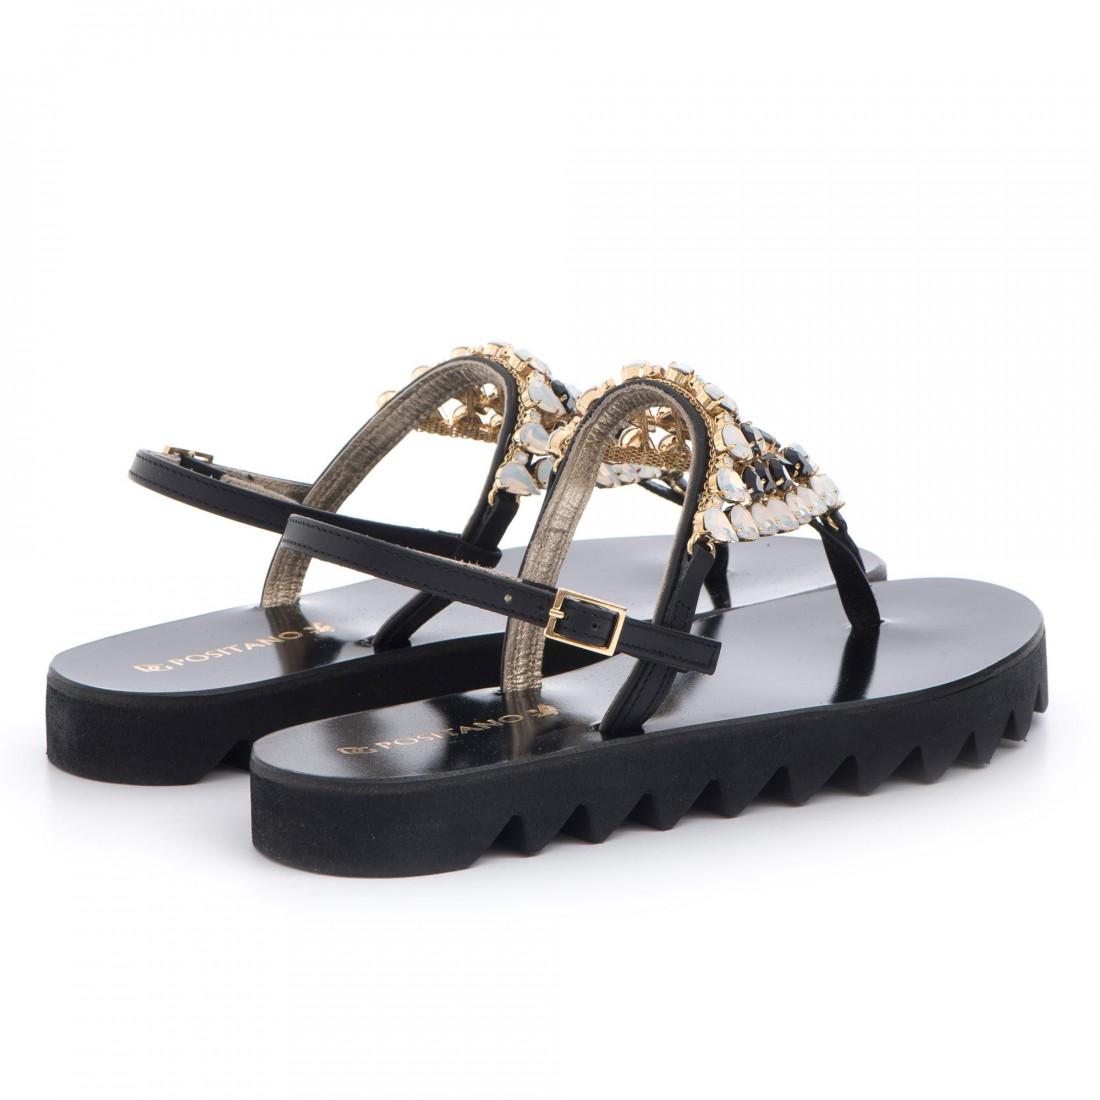 sandals woman positano 4911vit nero 3401